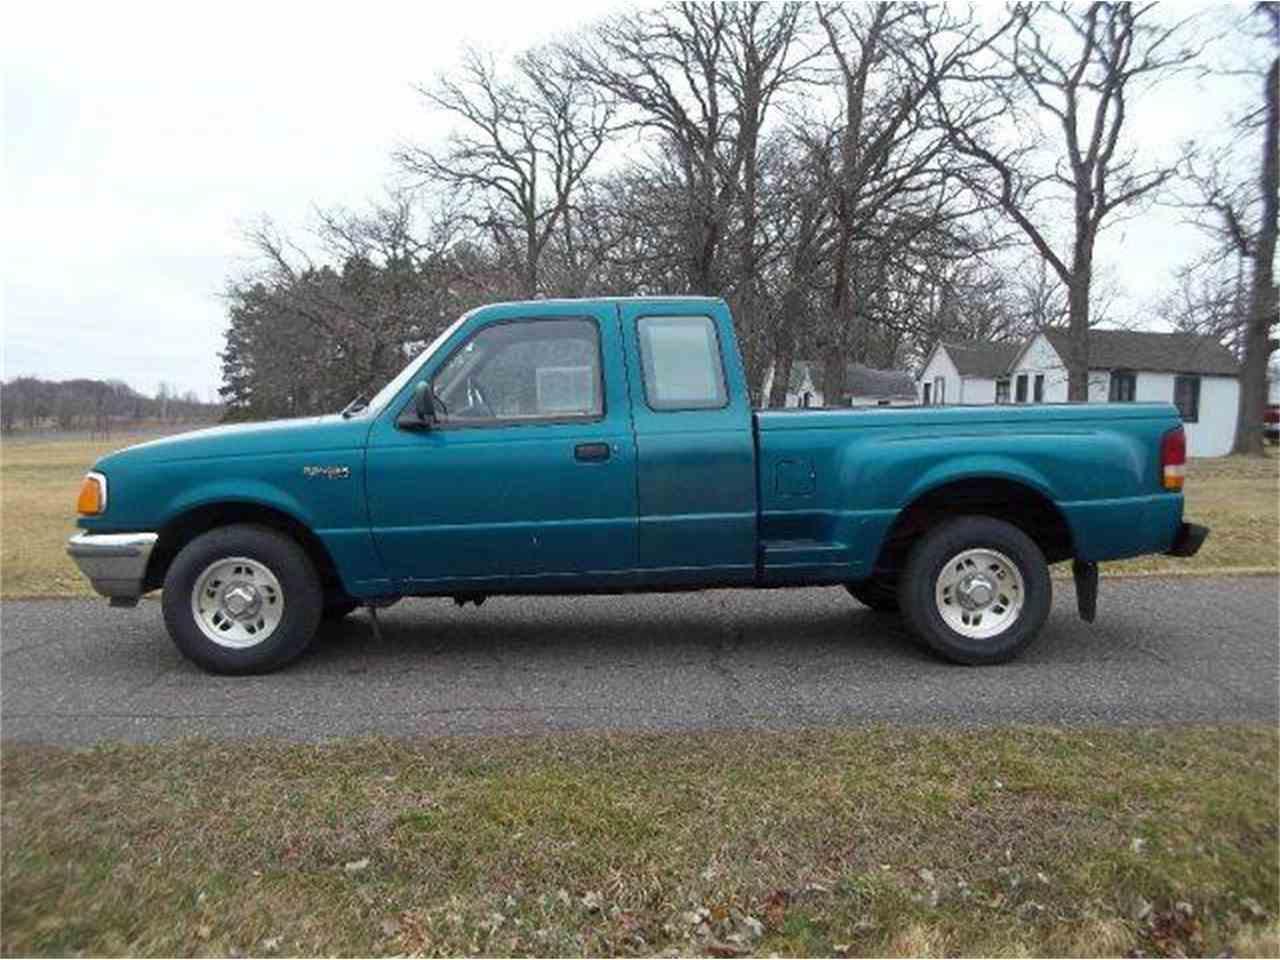 1996 Ford Ranger for Sale | ClassicCars.com | CC-1059336